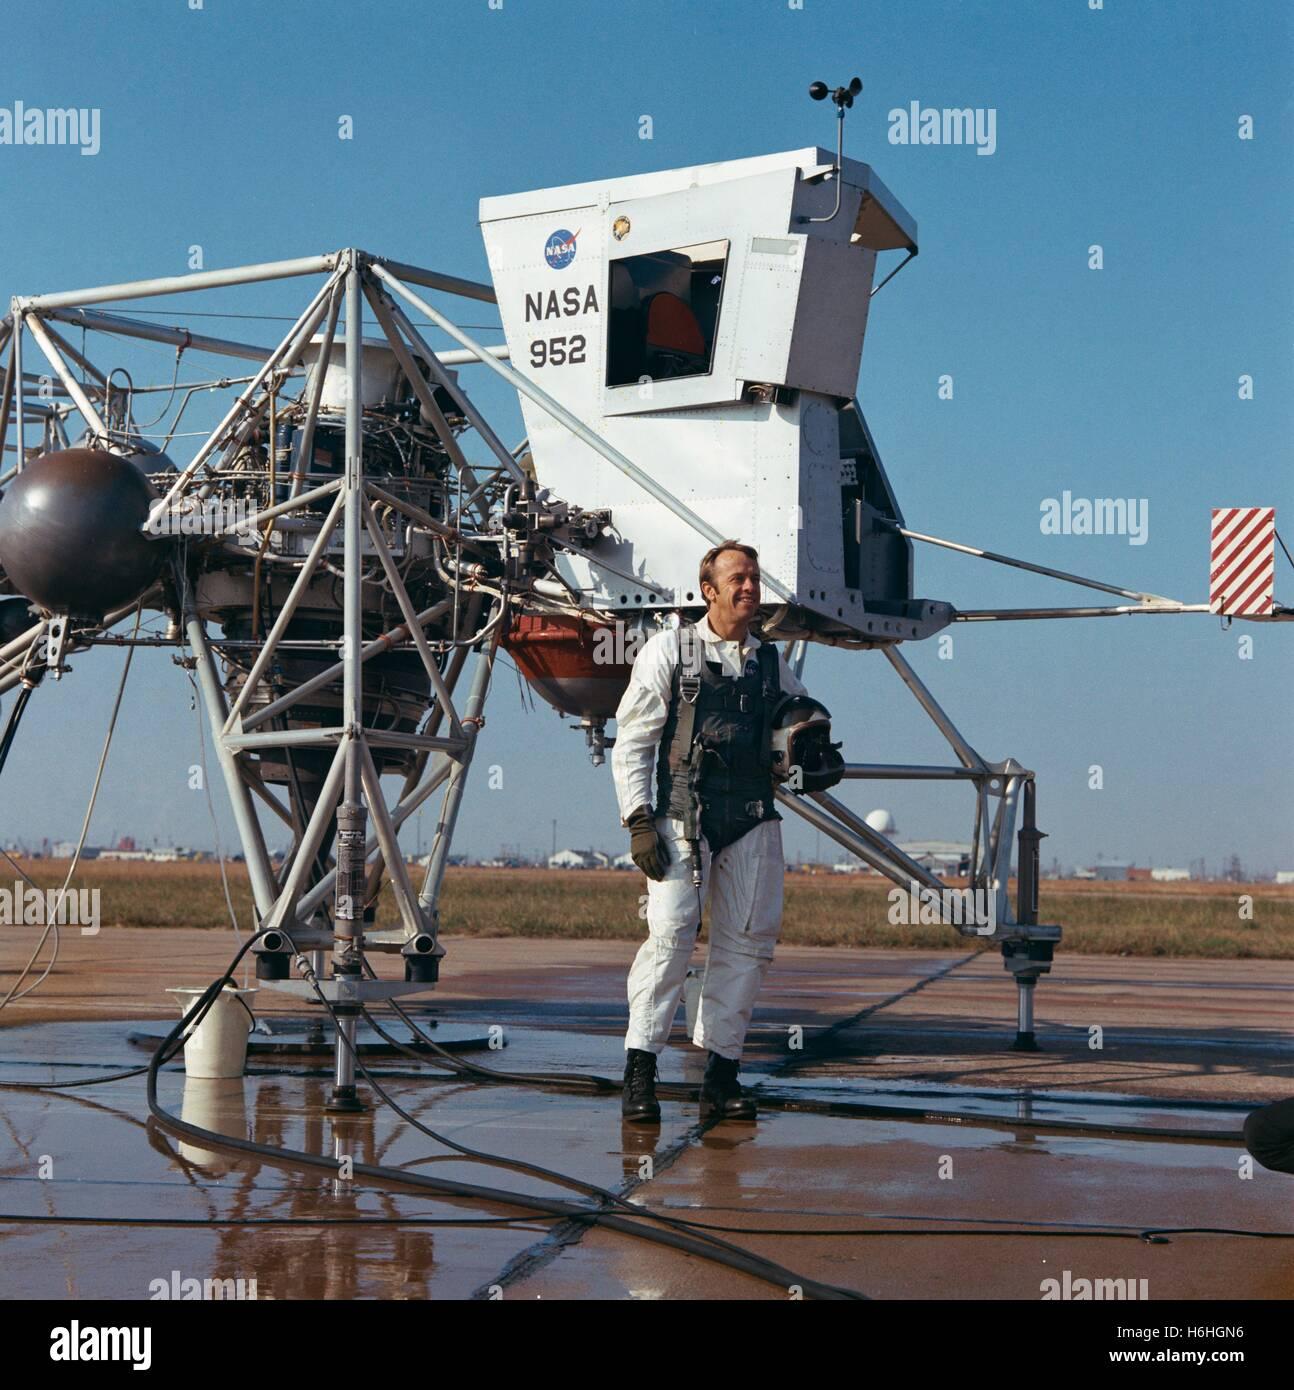 NASA Apollo 14 lunar landing mission astronaut American Alan Shepard stands next to a Lunar Landing Training Vehicle - Stock Image